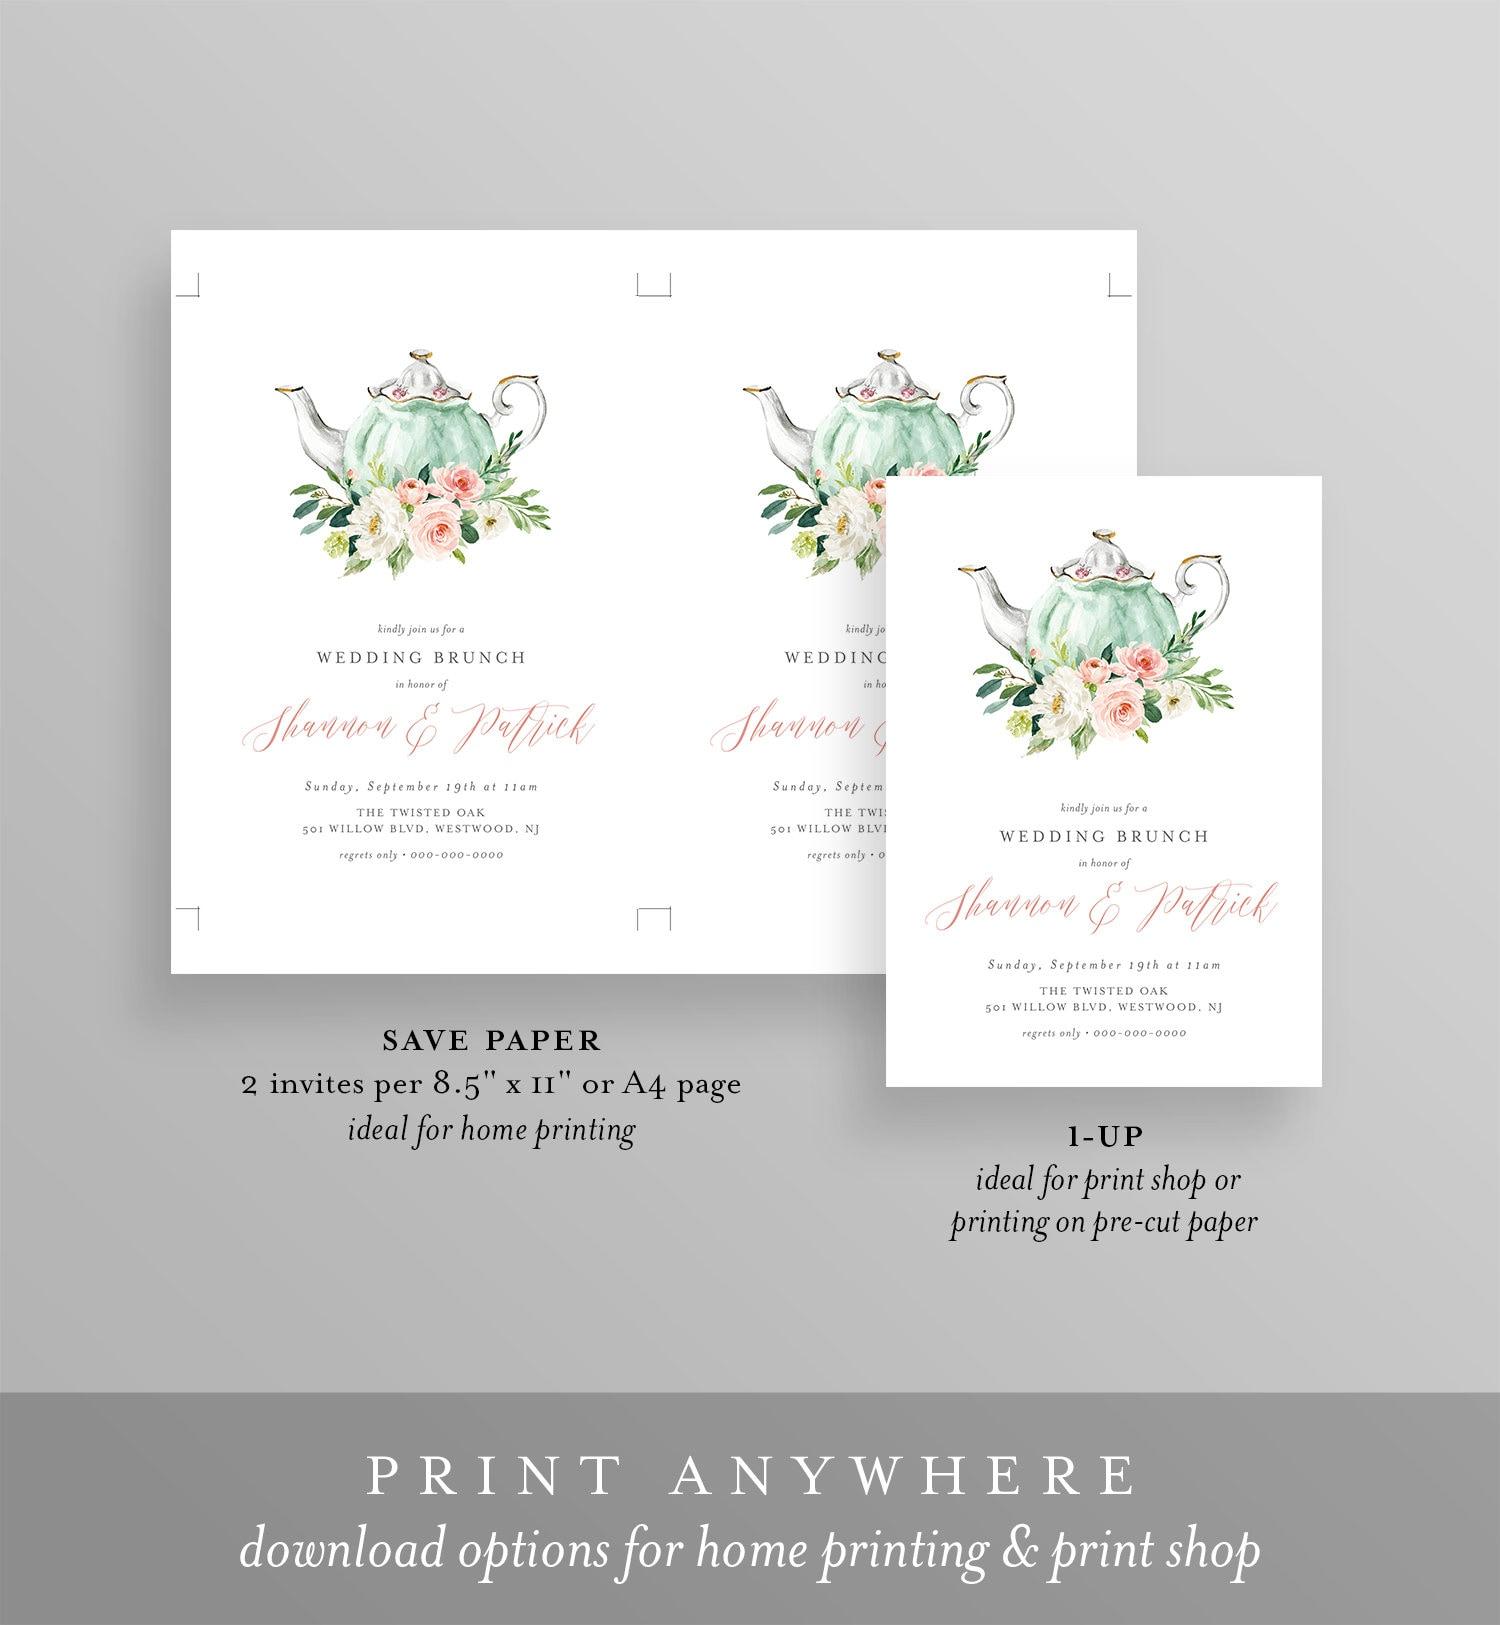 Instant Download Digital Editable Text Printable Post Wedding Tea Party Invite Wedding Brunch Invitation Template TEMPLETT #085-106BR